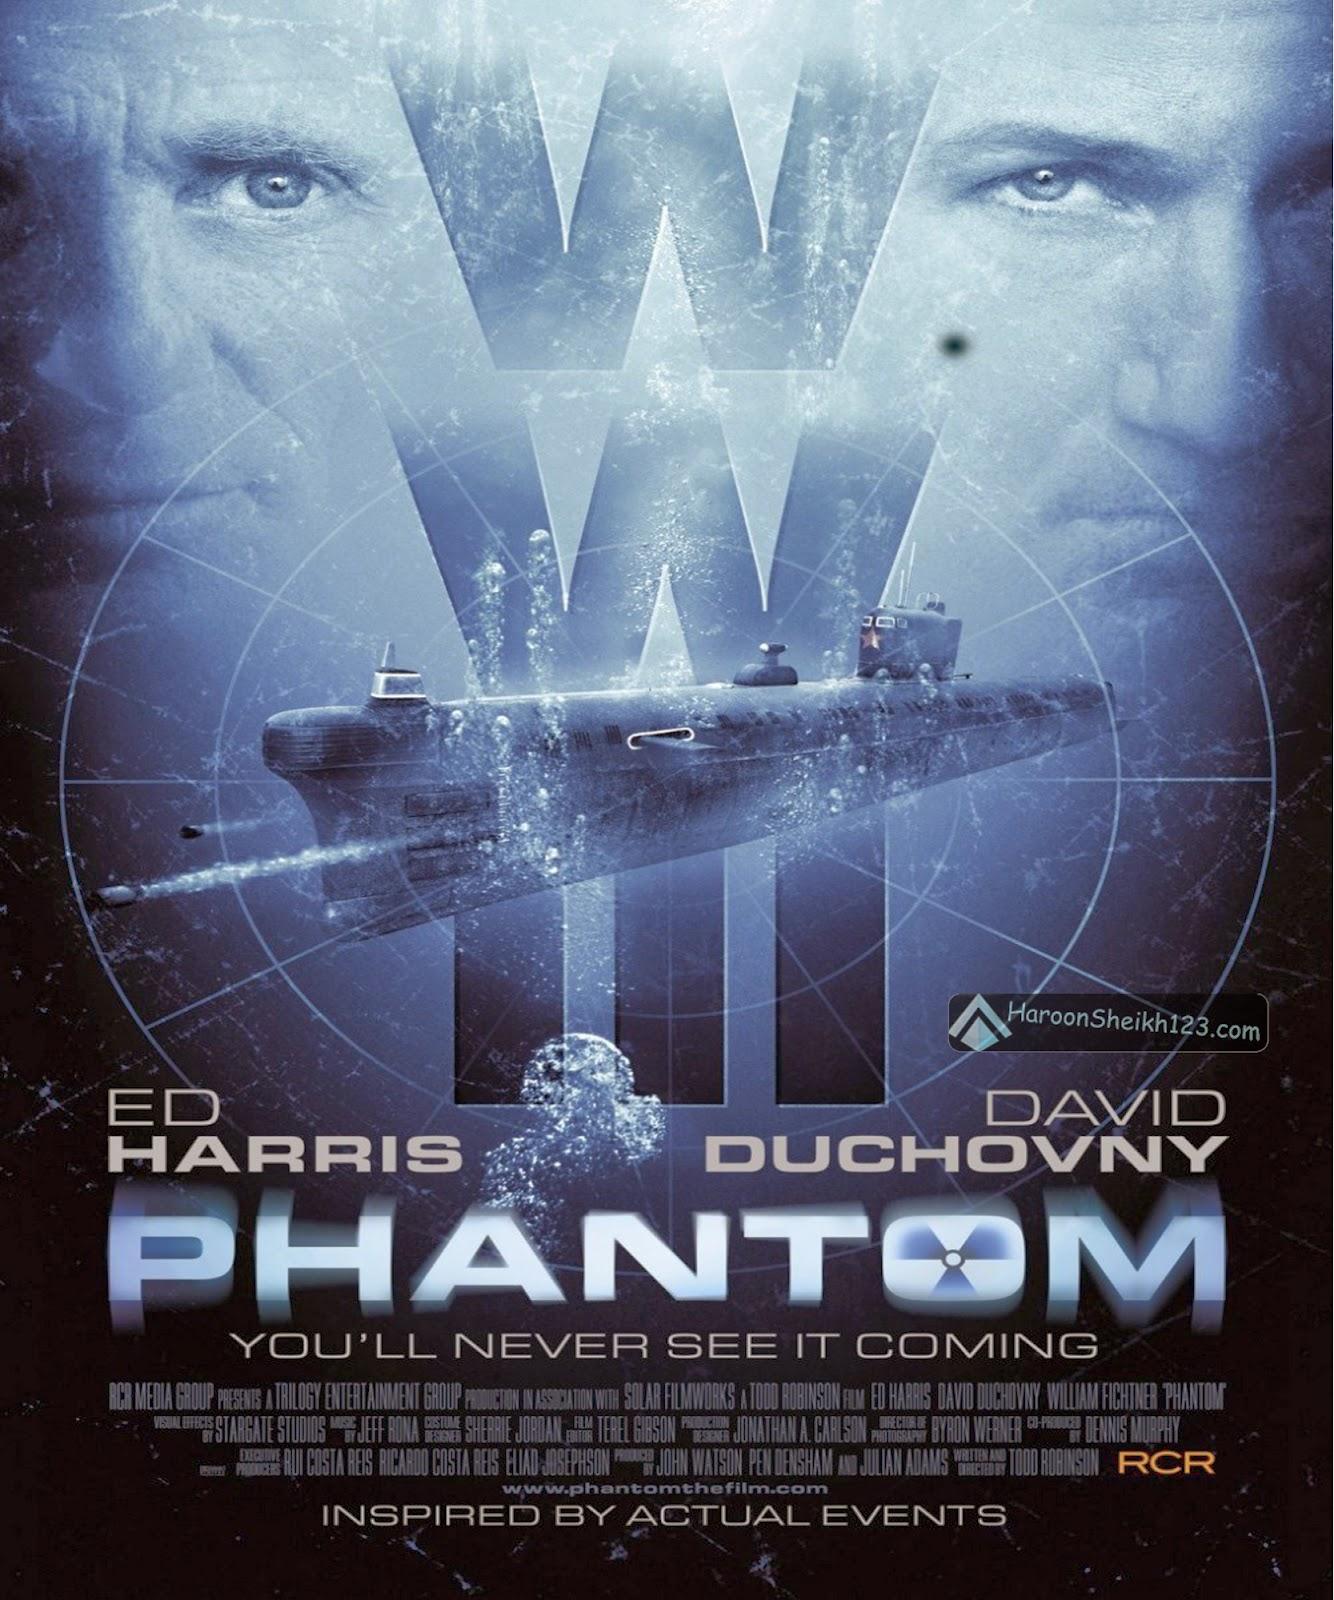 Phantom 2013 Hindi Dubbed Movie Watch Online | Watch Indian